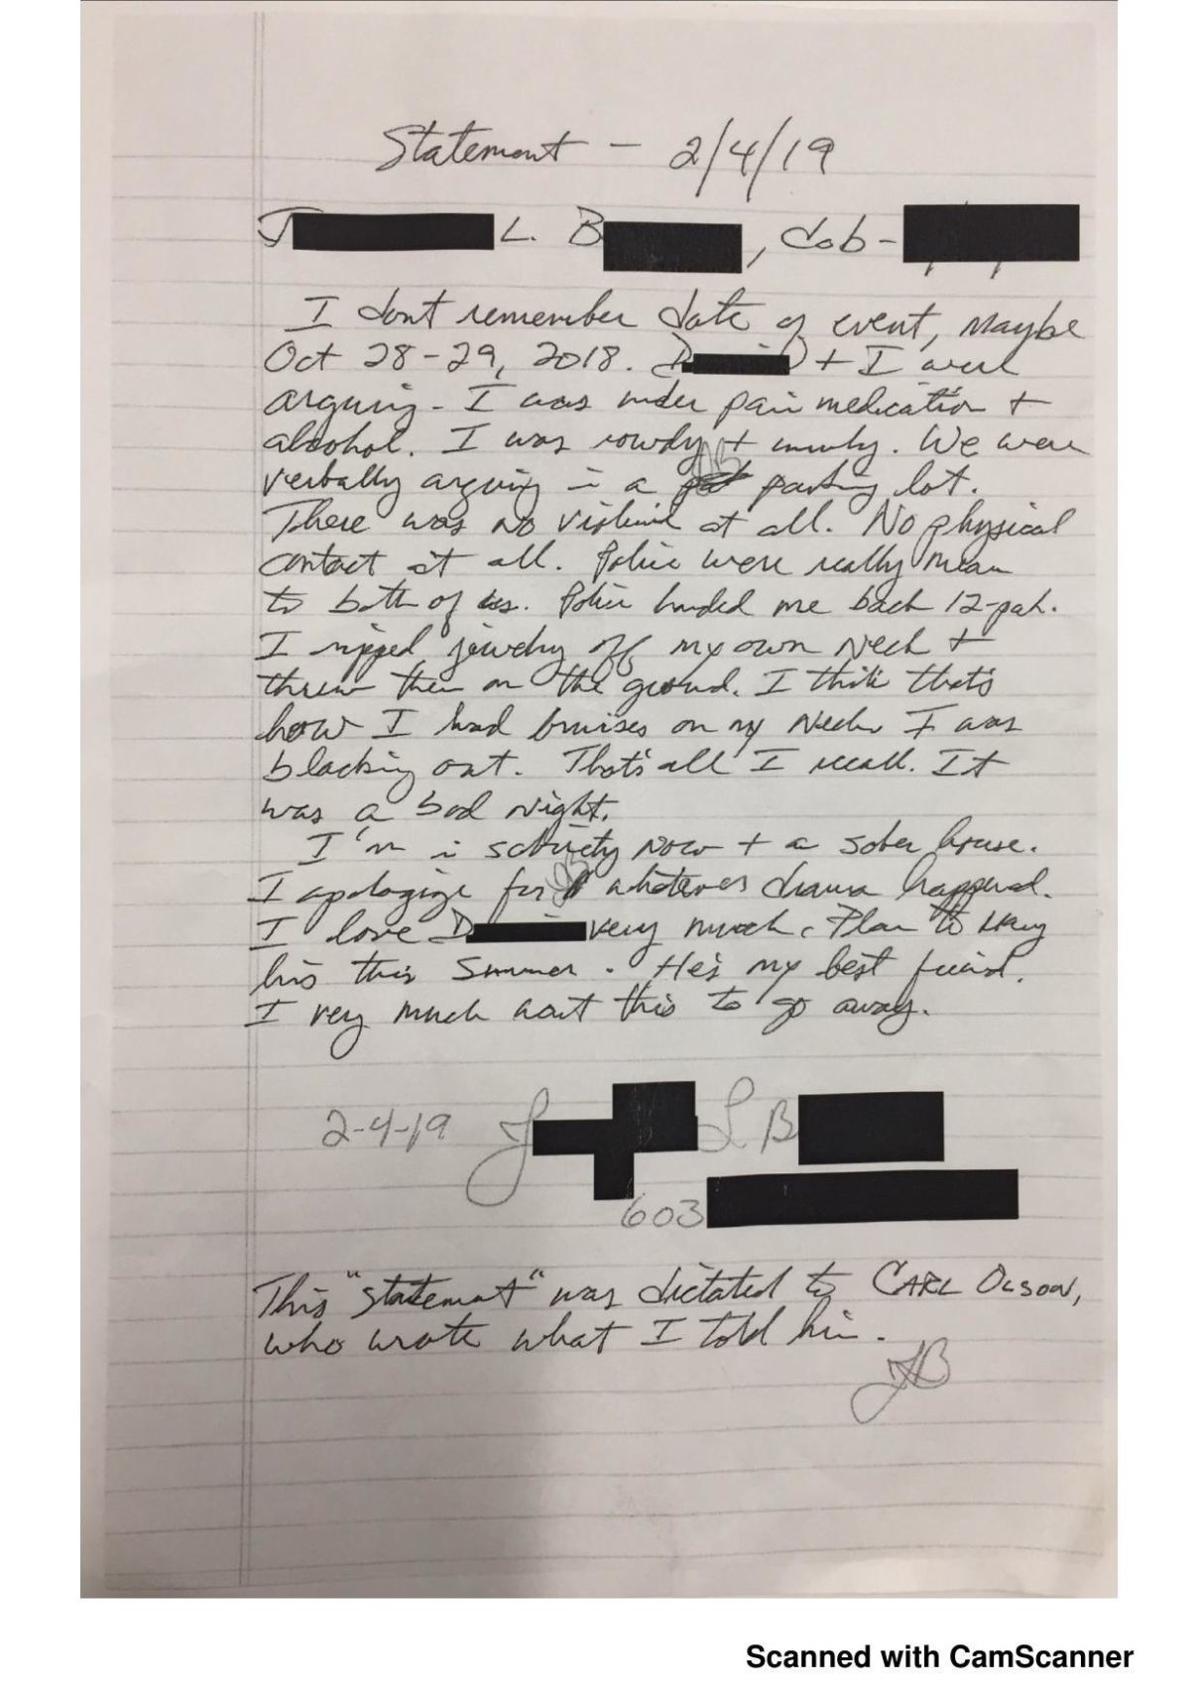 Burpee letter